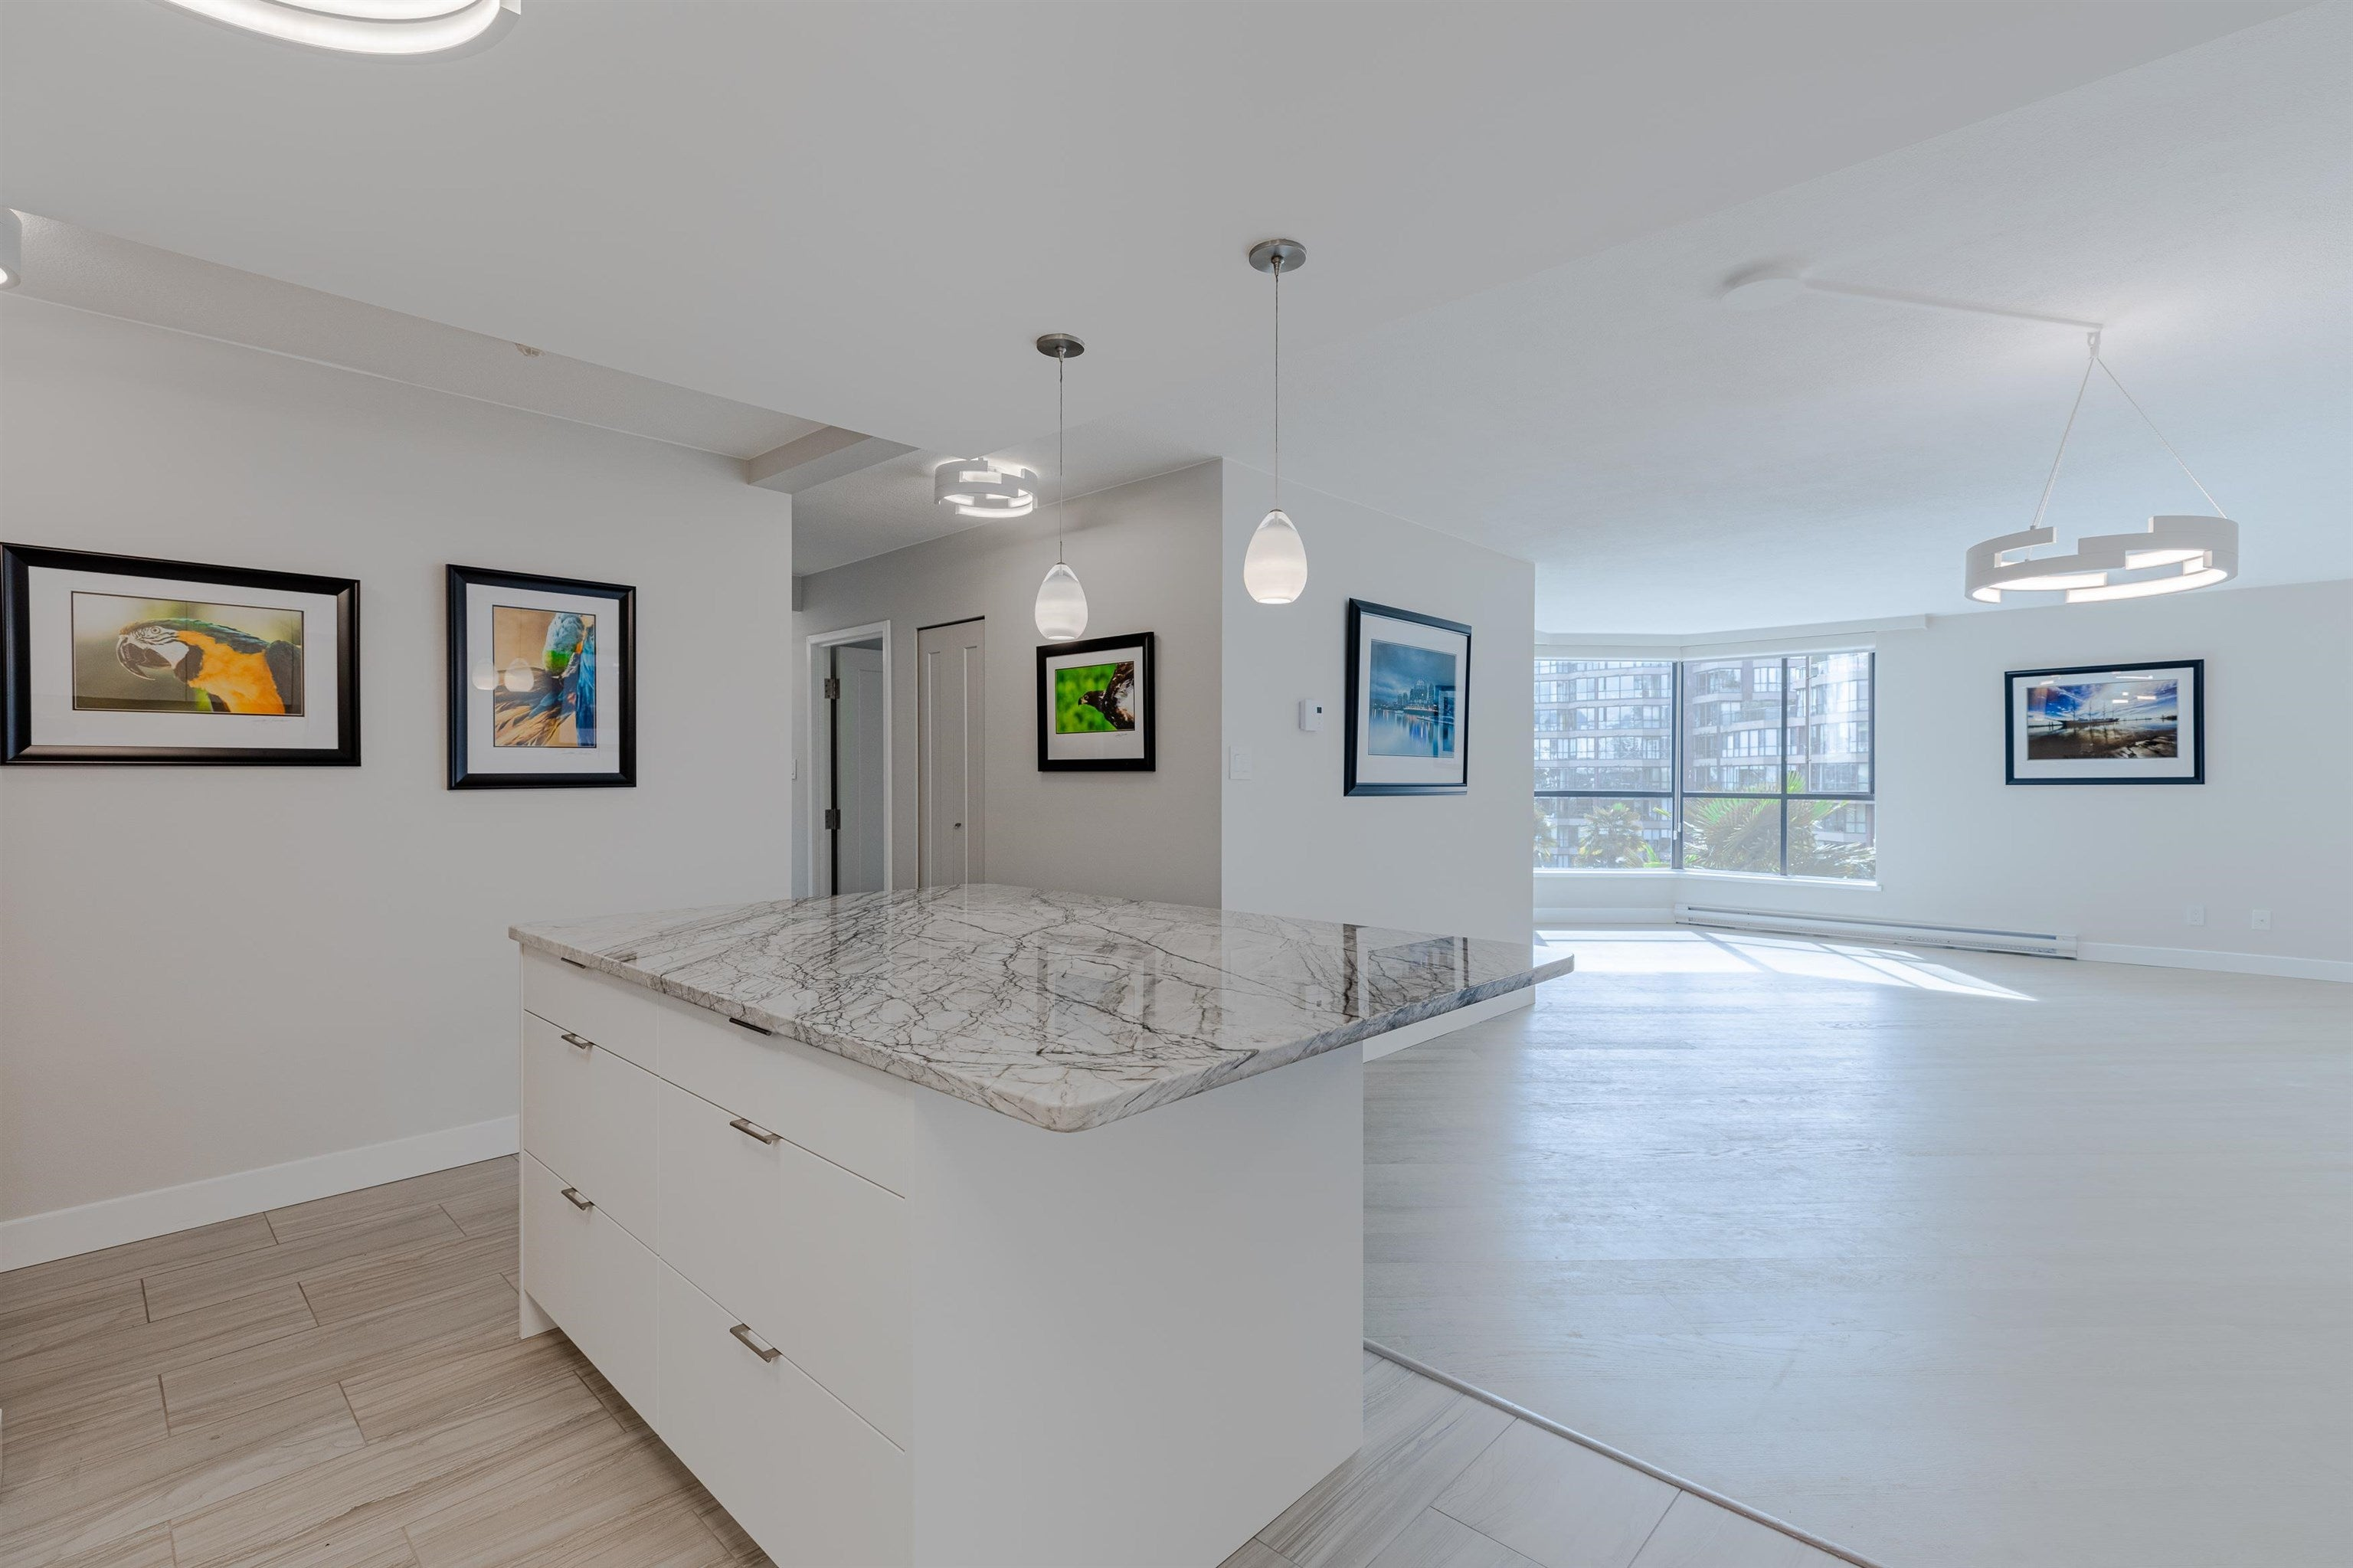 406 1450 PENNYFARTHING DRIVE - False Creek Apartment/Condo for sale, 2 Bedrooms (R2617259) - #5